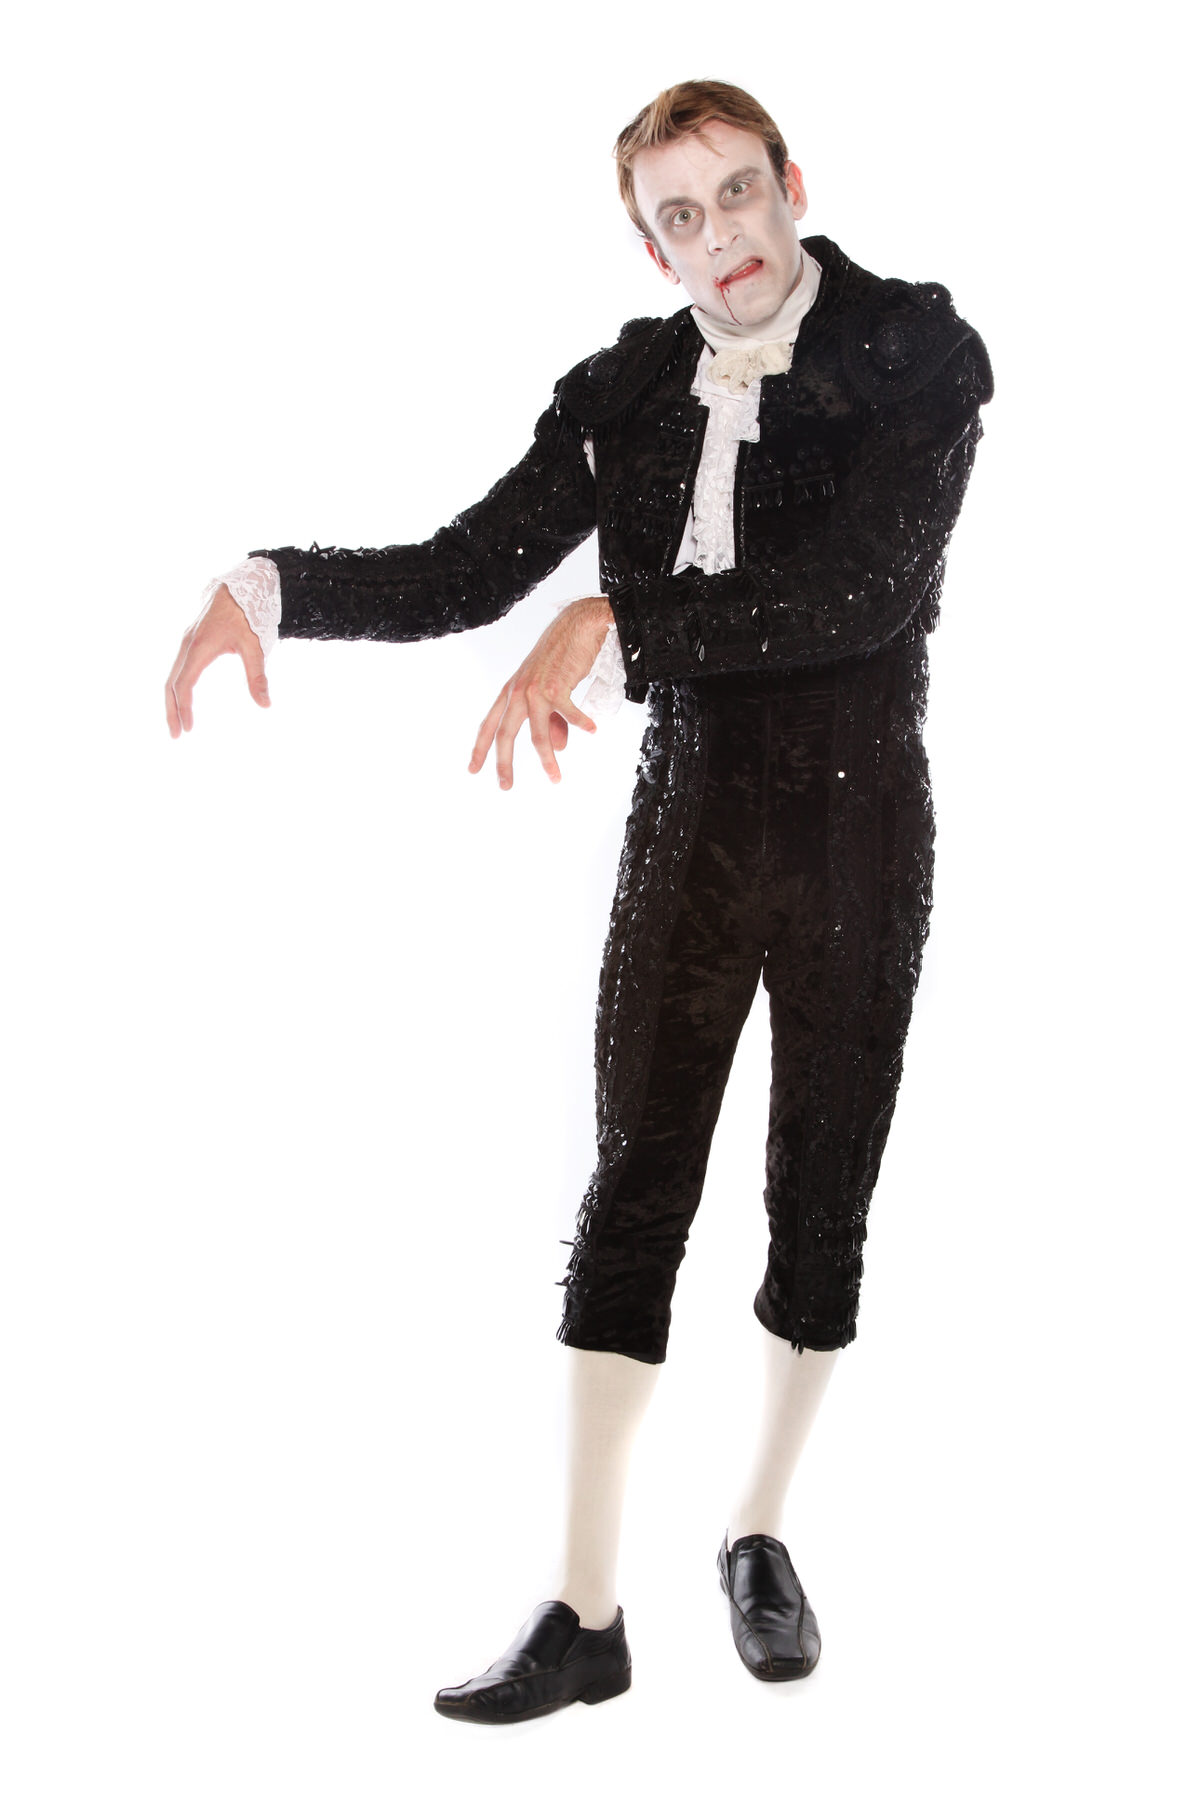 DEAD MATADOR COSTUME WITH BOLERO JACKET